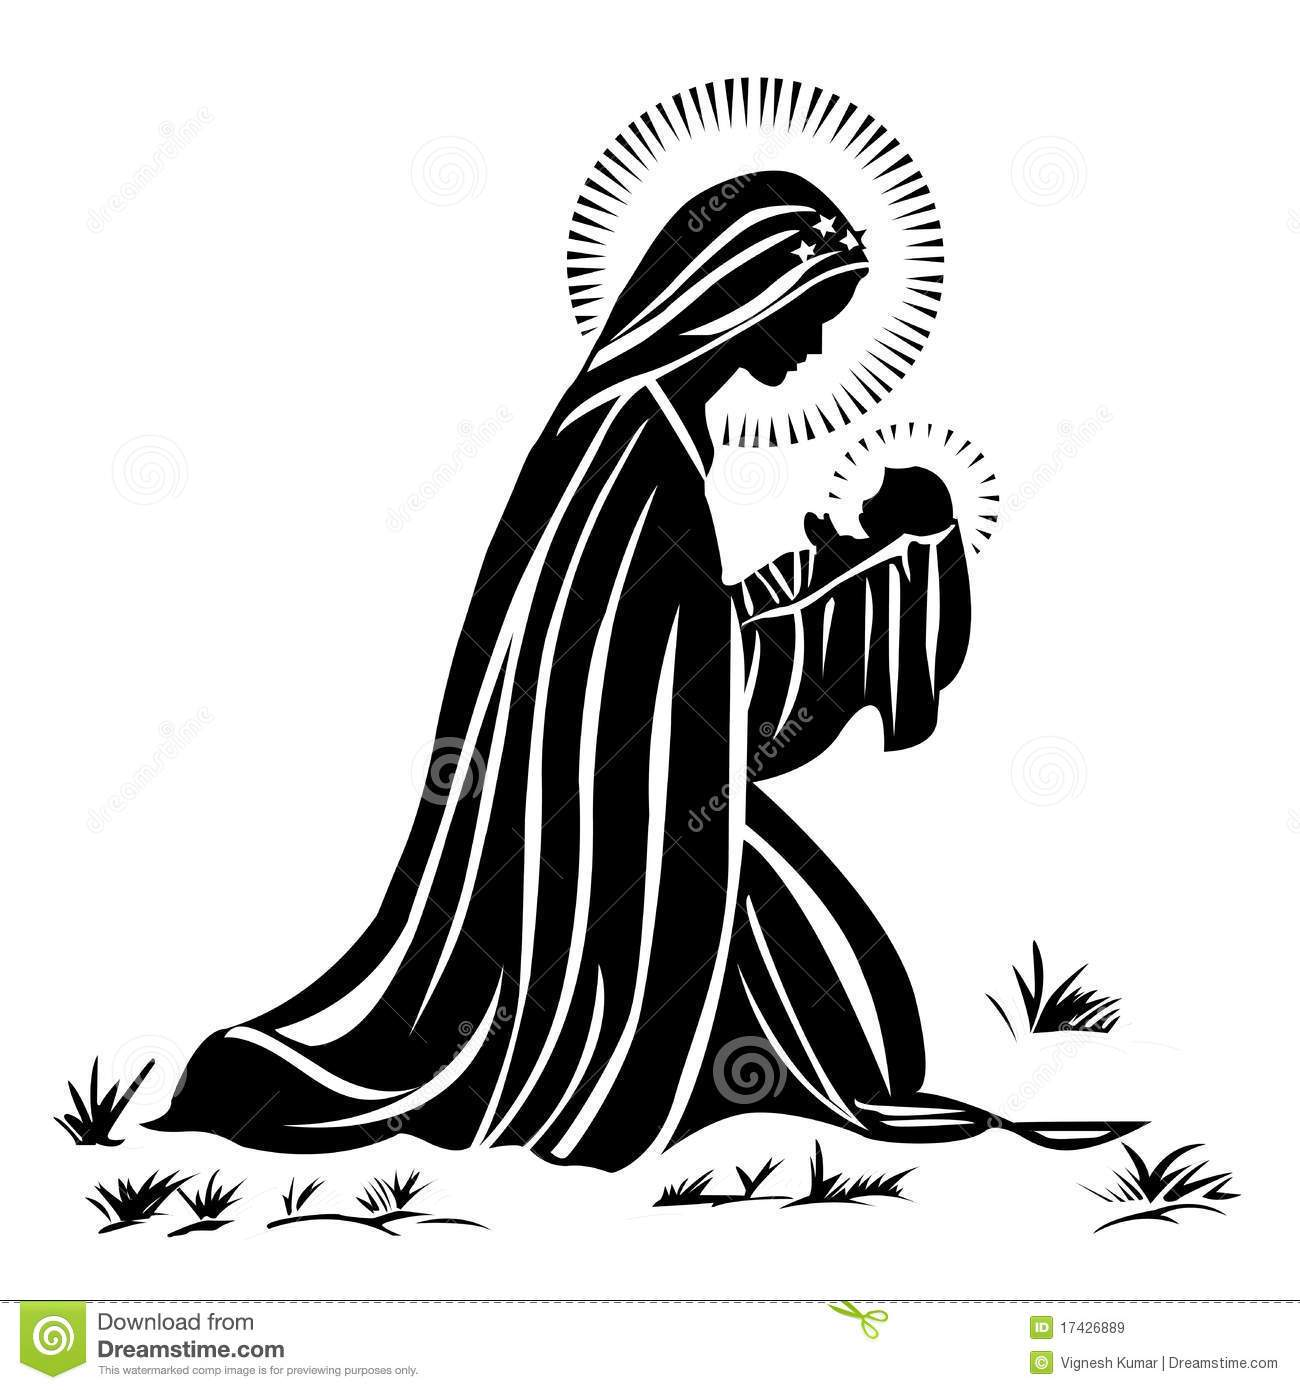 Mary baby jesus clipart 4 » Clipart Portal.